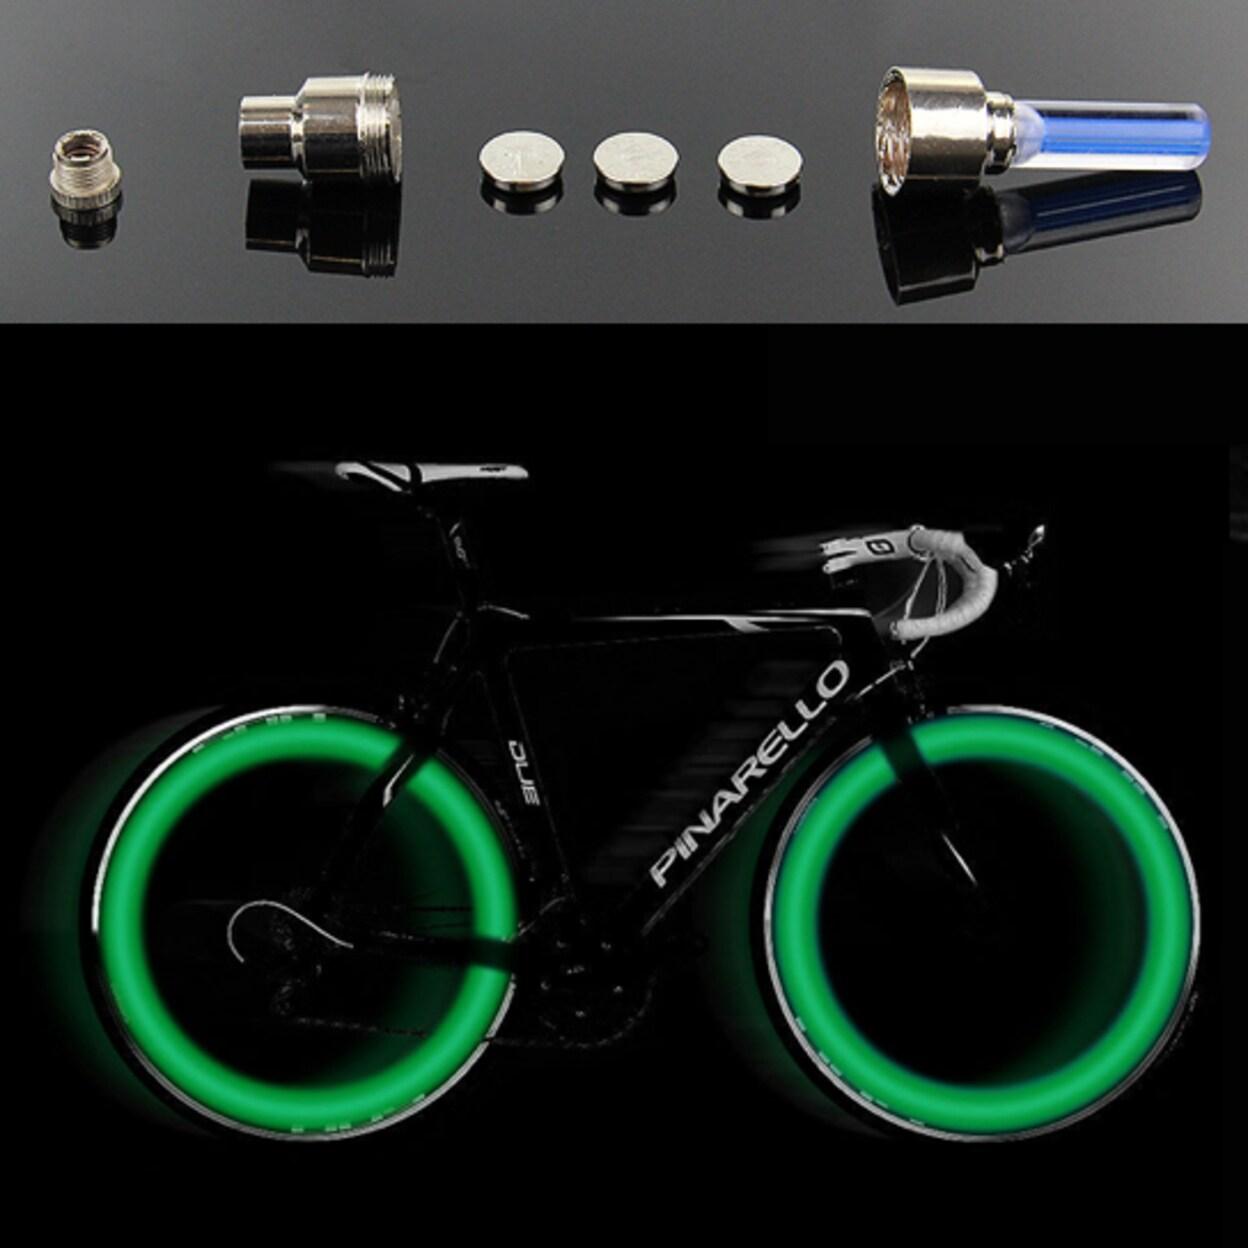 1 Pack Neon LED Tire Wheel Valve Stem Cap Light For Car Bike Bicycle Motorcycle